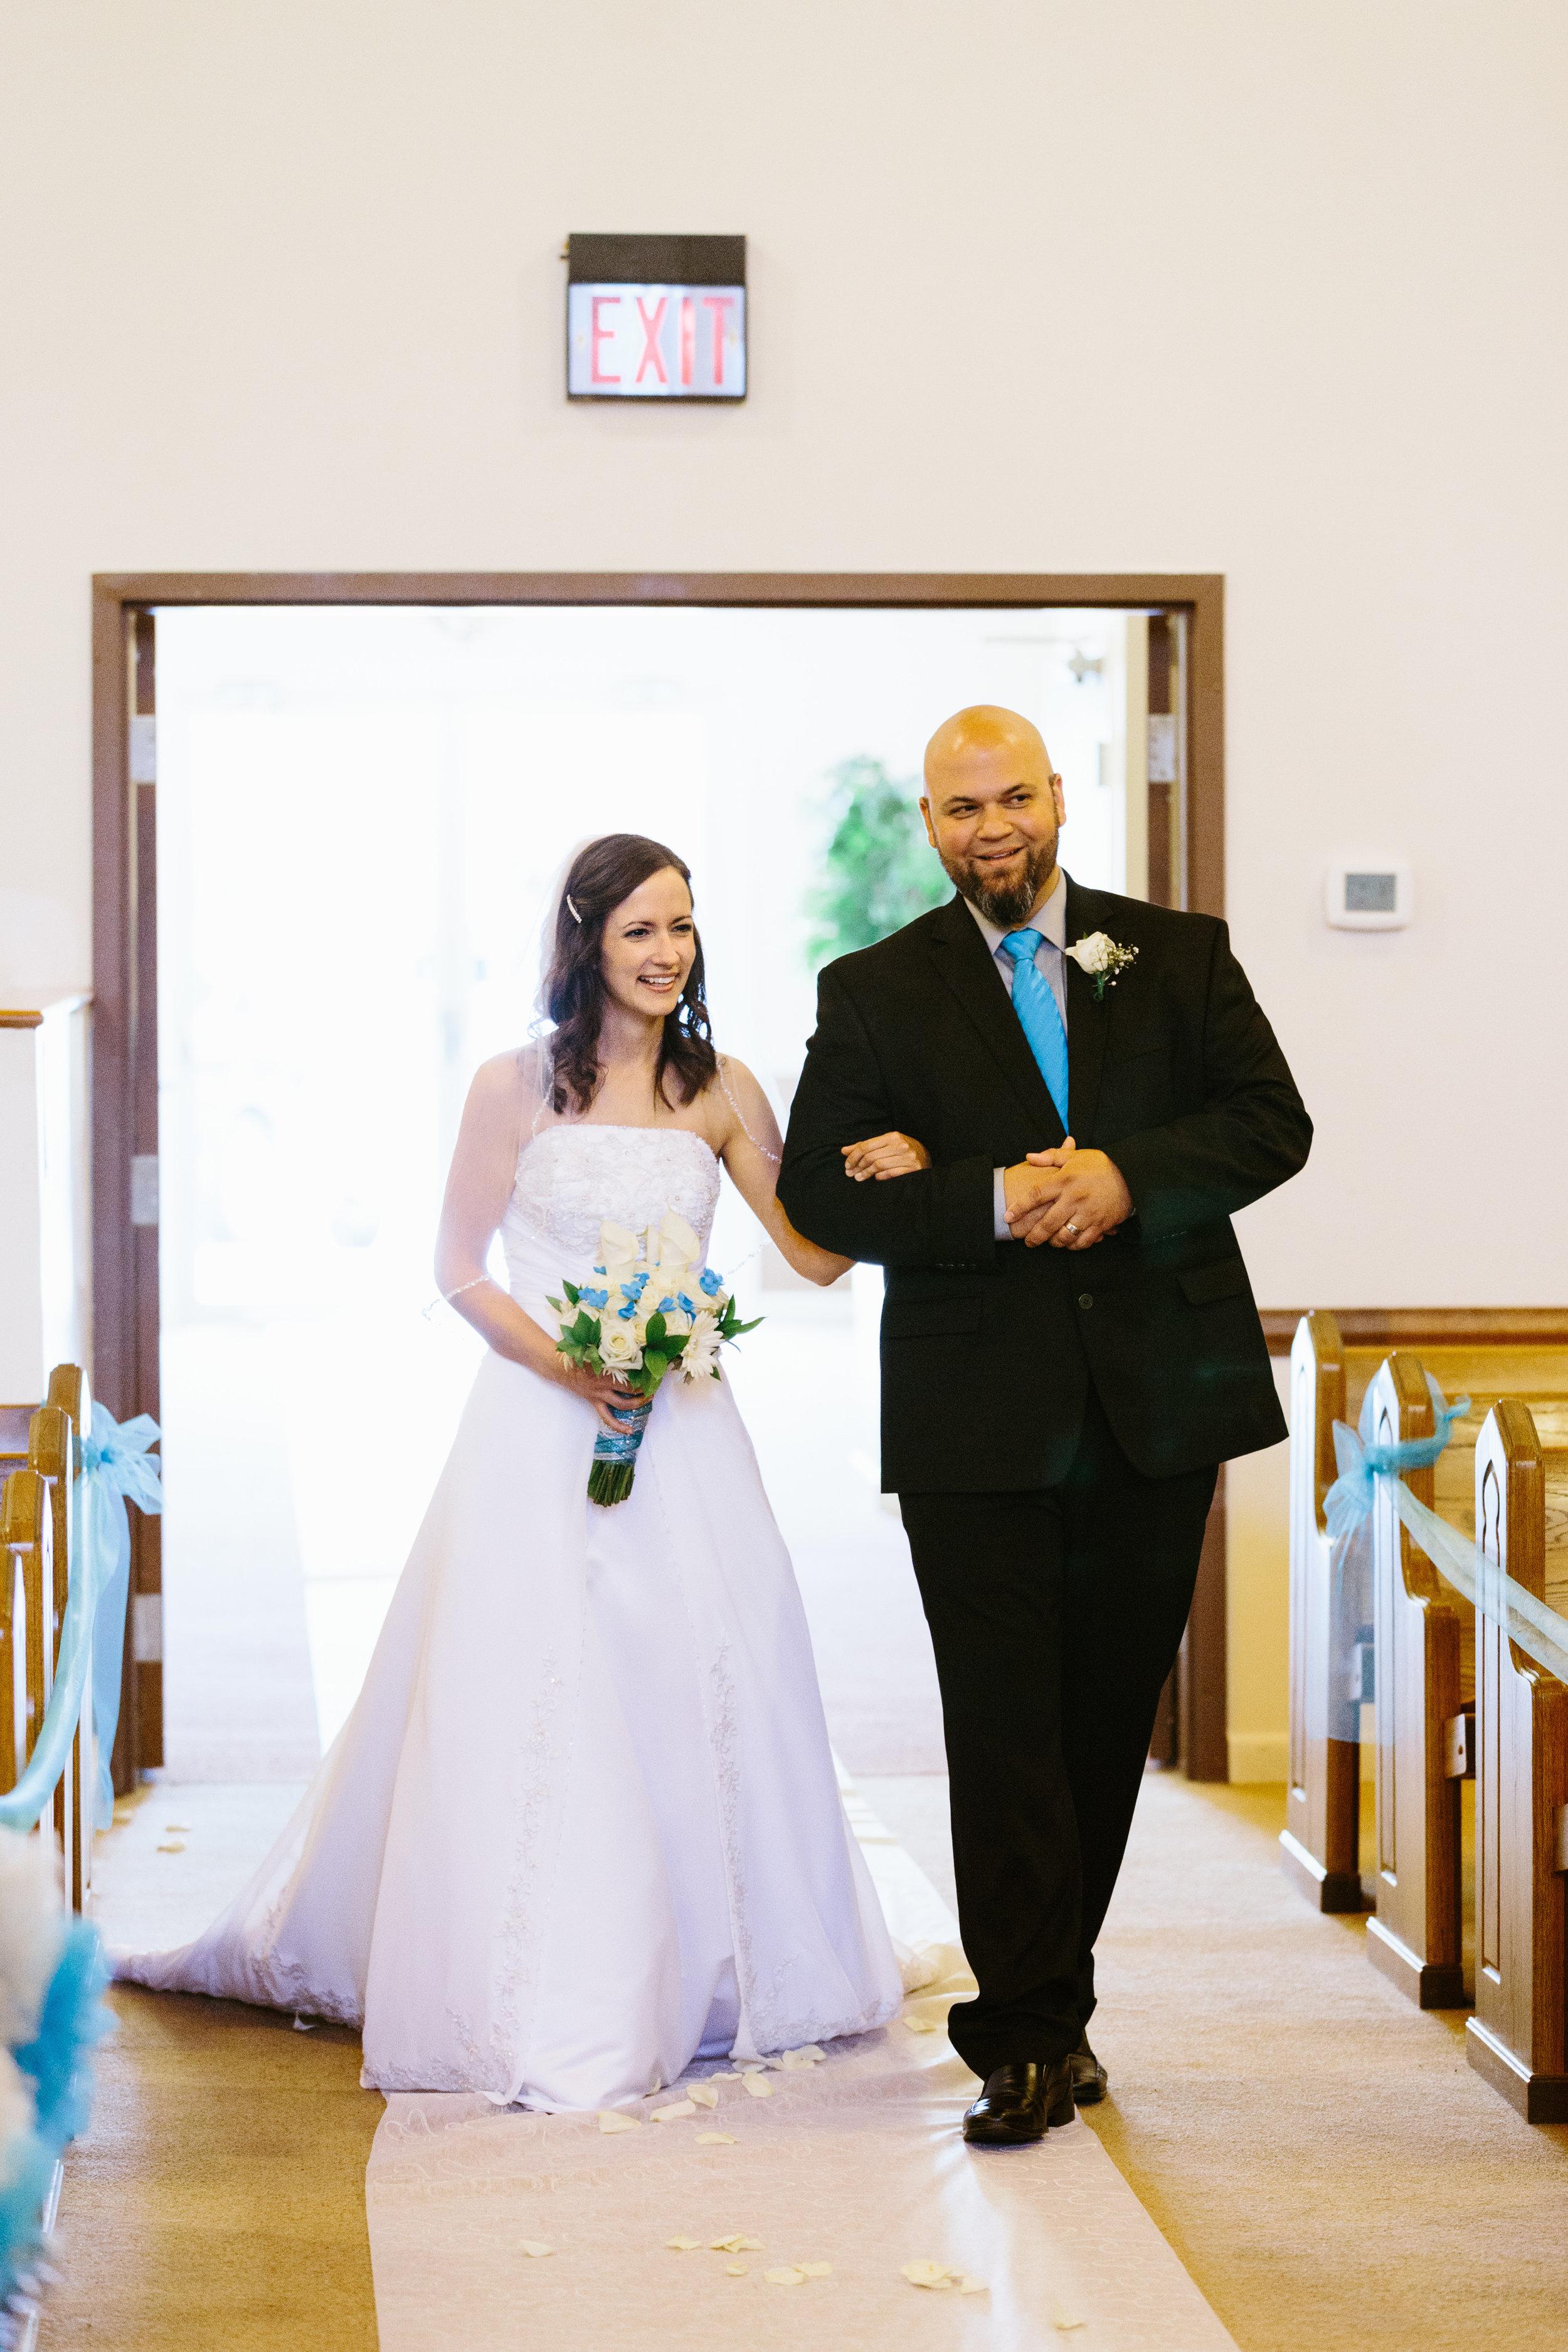 Teller-Payich Wedding-227.jpg